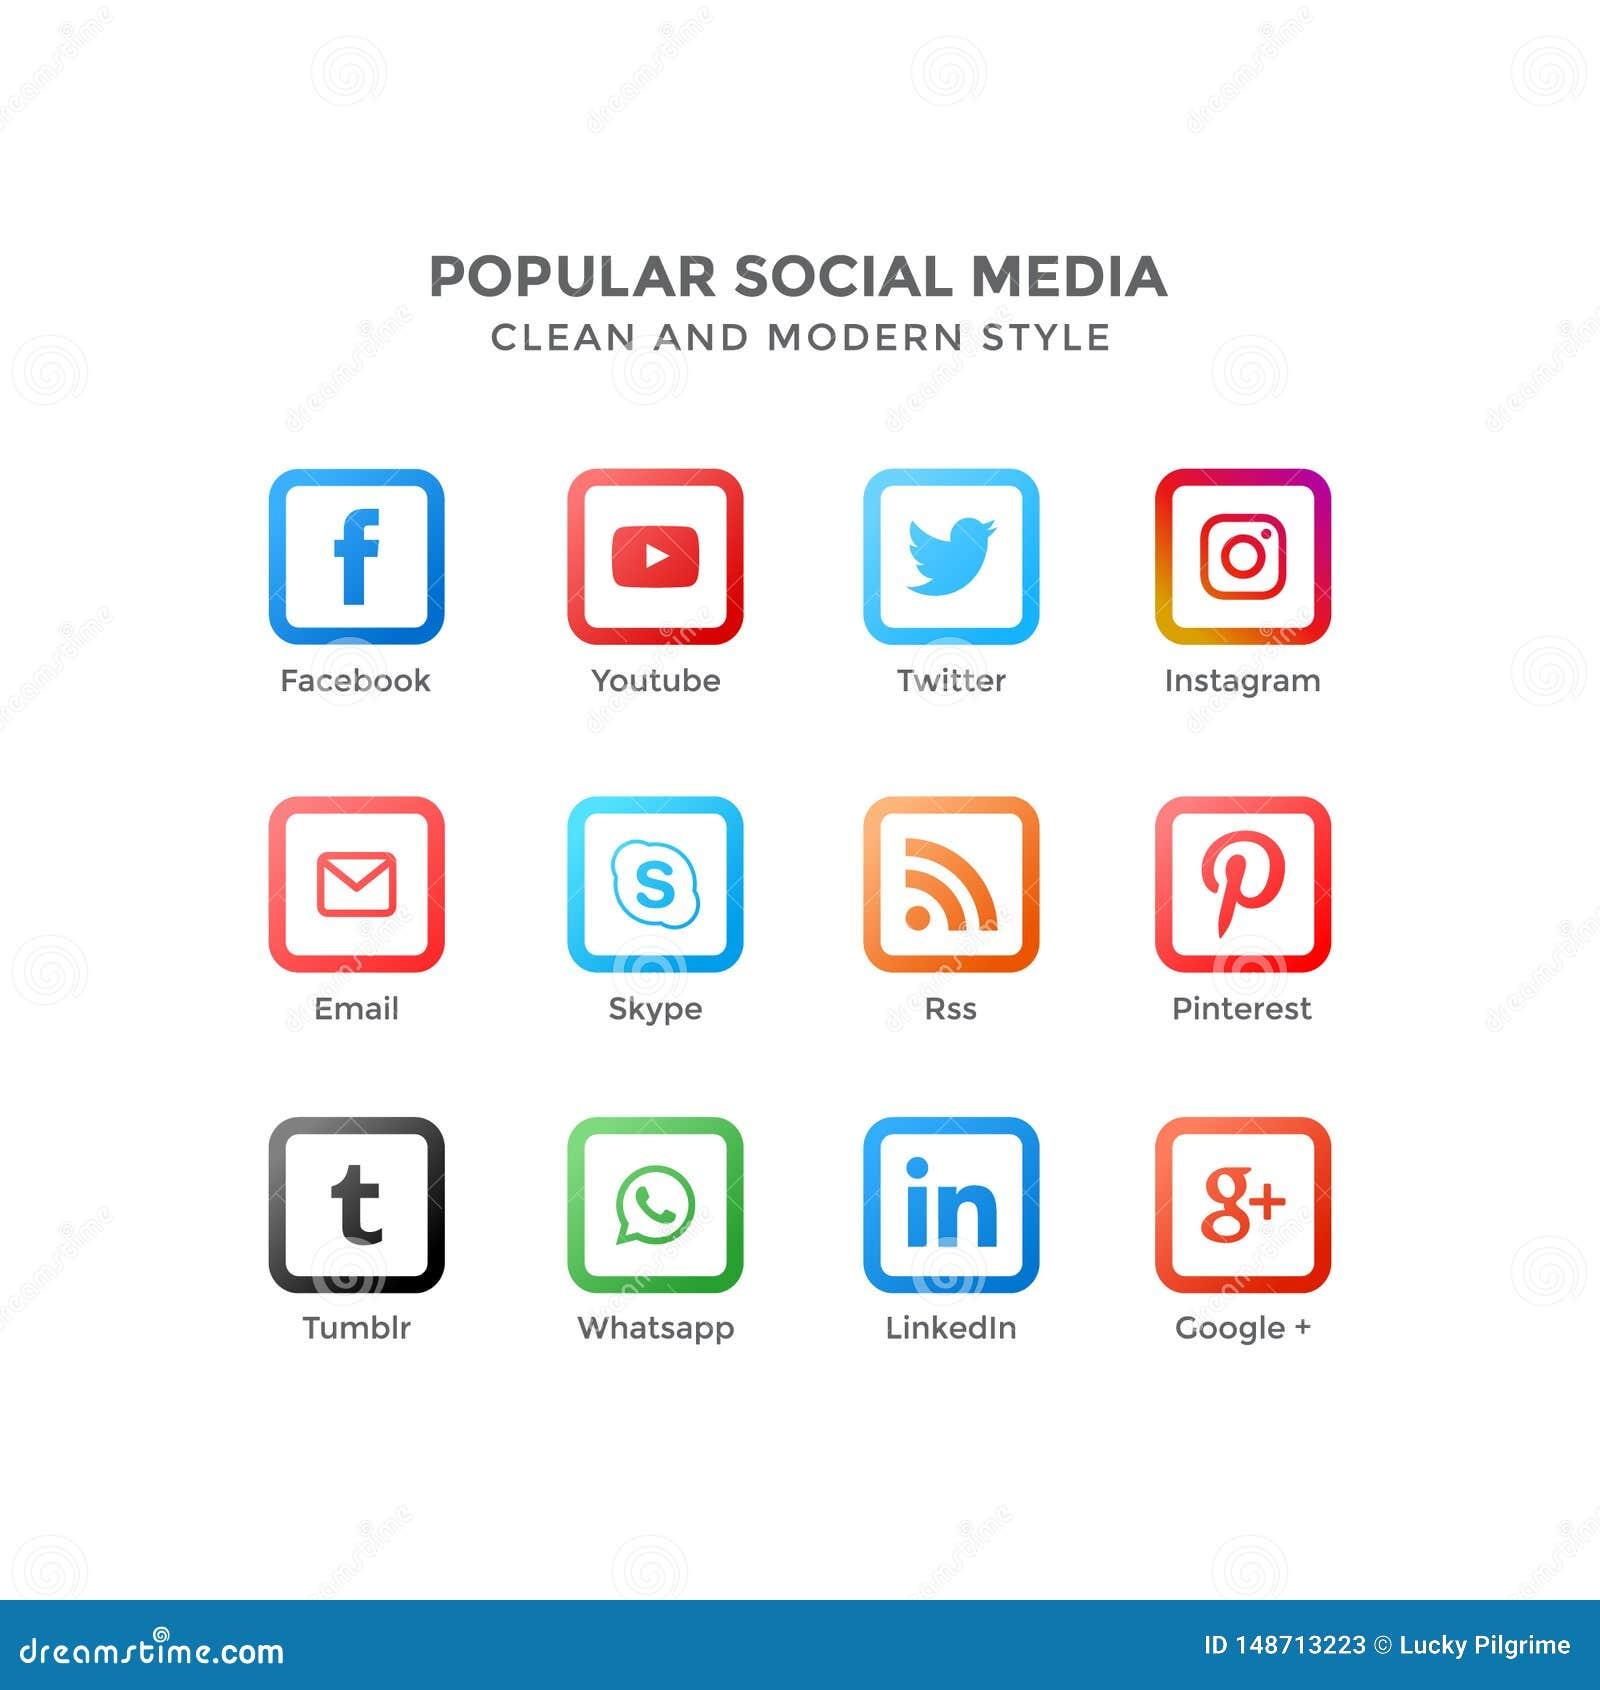 Vektorikonen des popul?ren Social Media in der sauberen und modernen Art